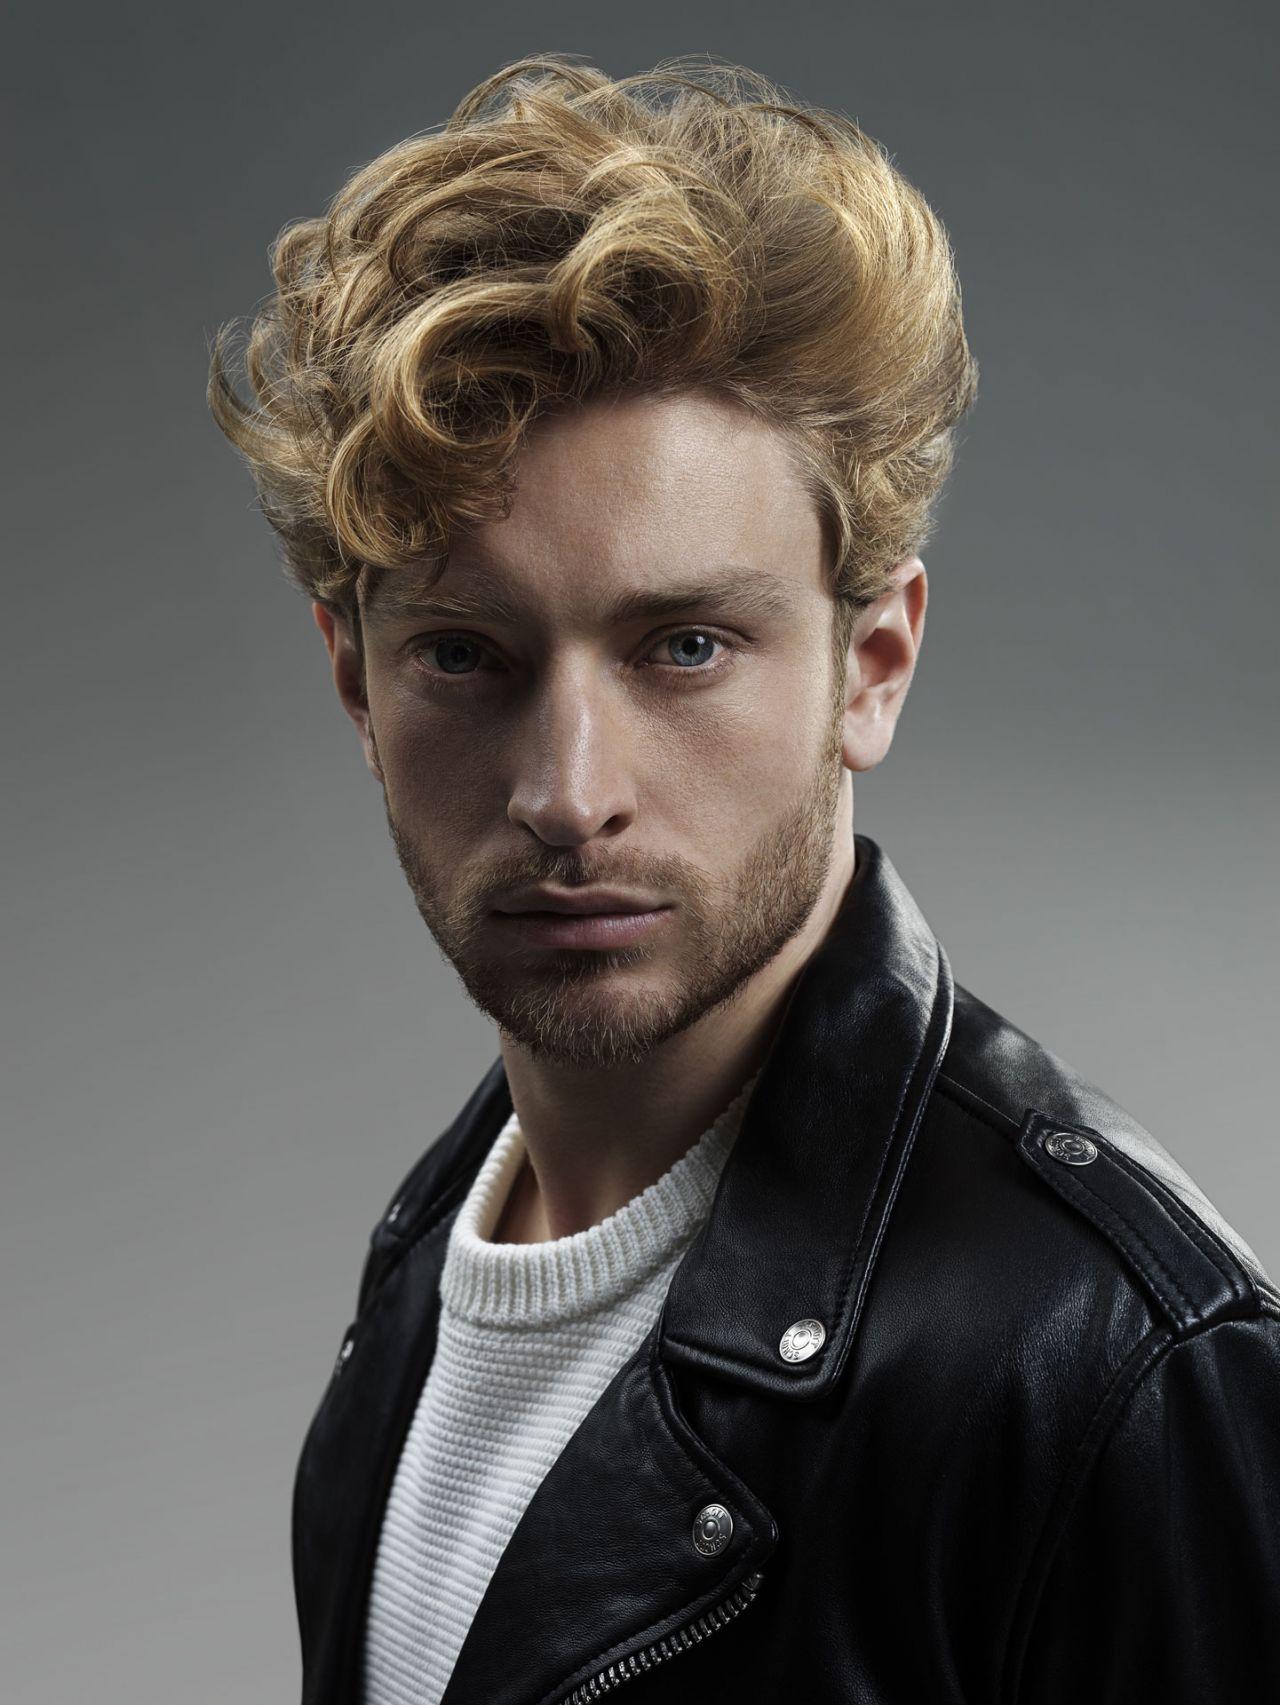 Blonde Frisuren Männer